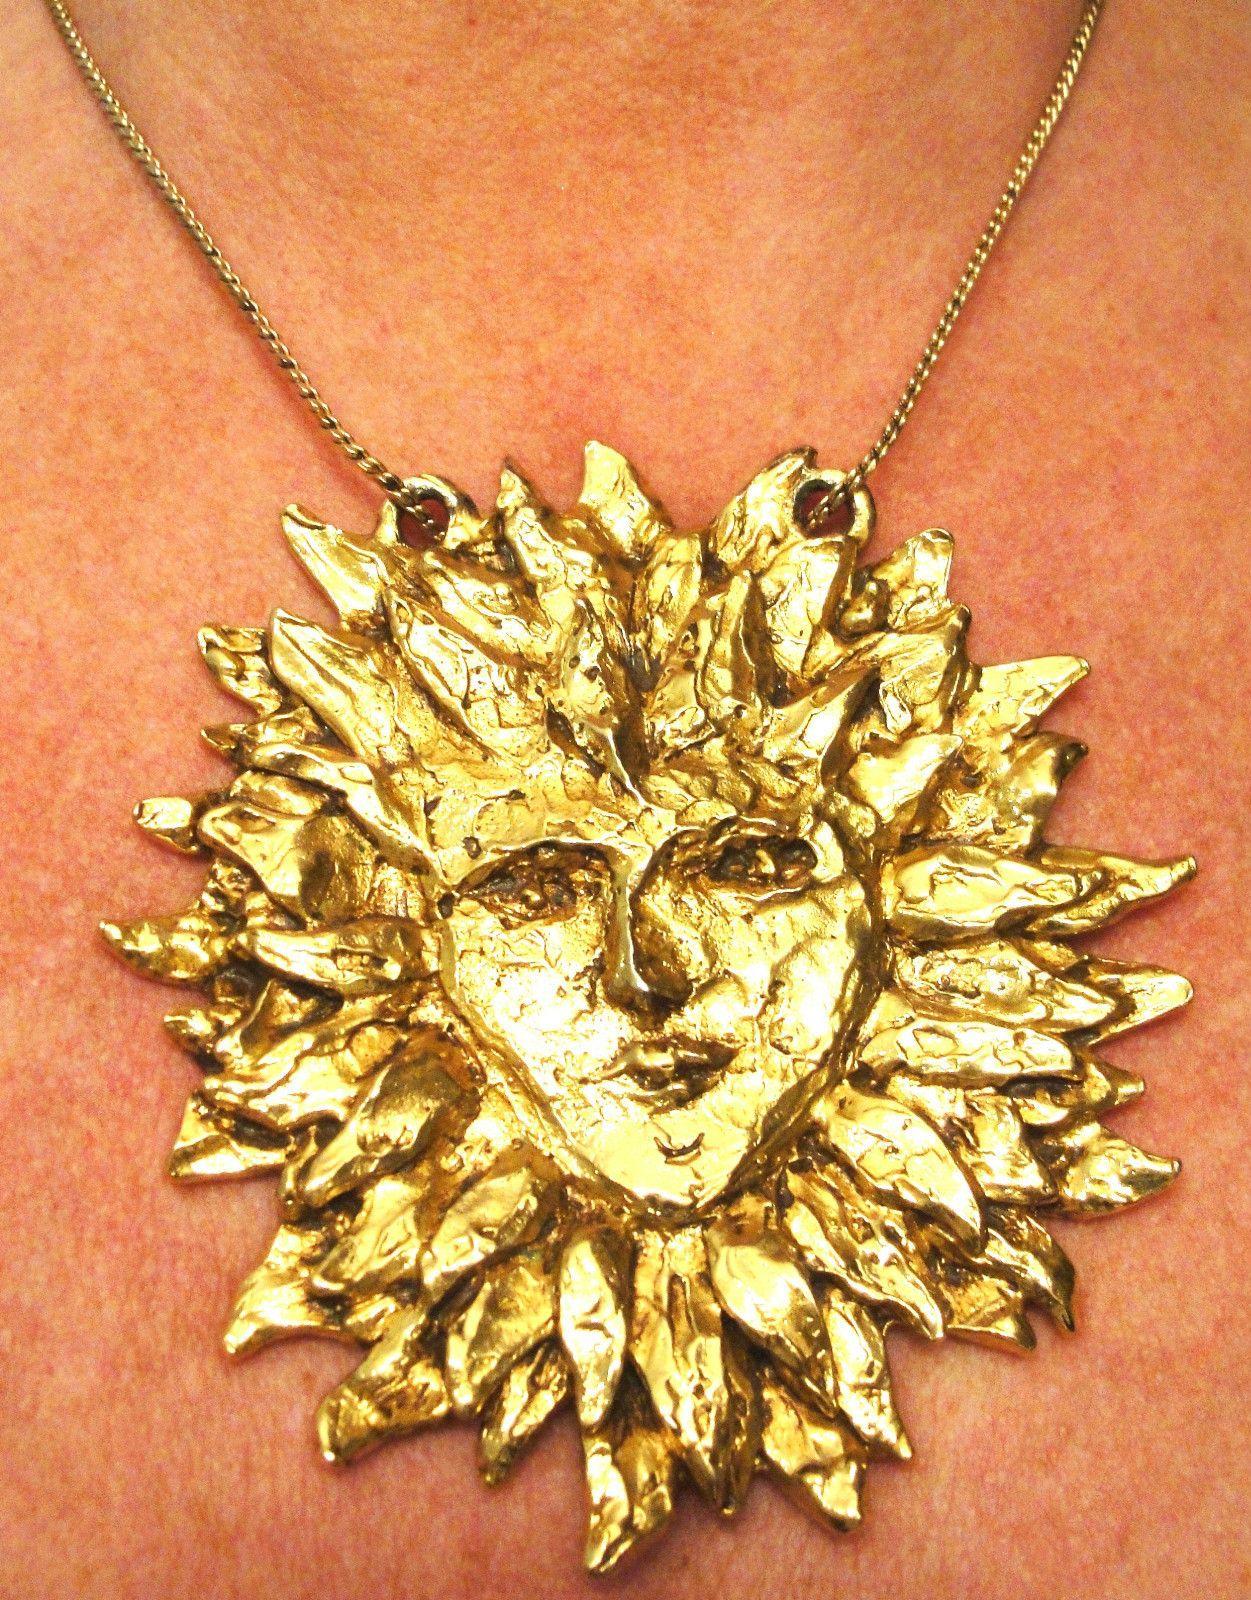 Ysl vintage sun pendant vintage jewelry accessories clothing